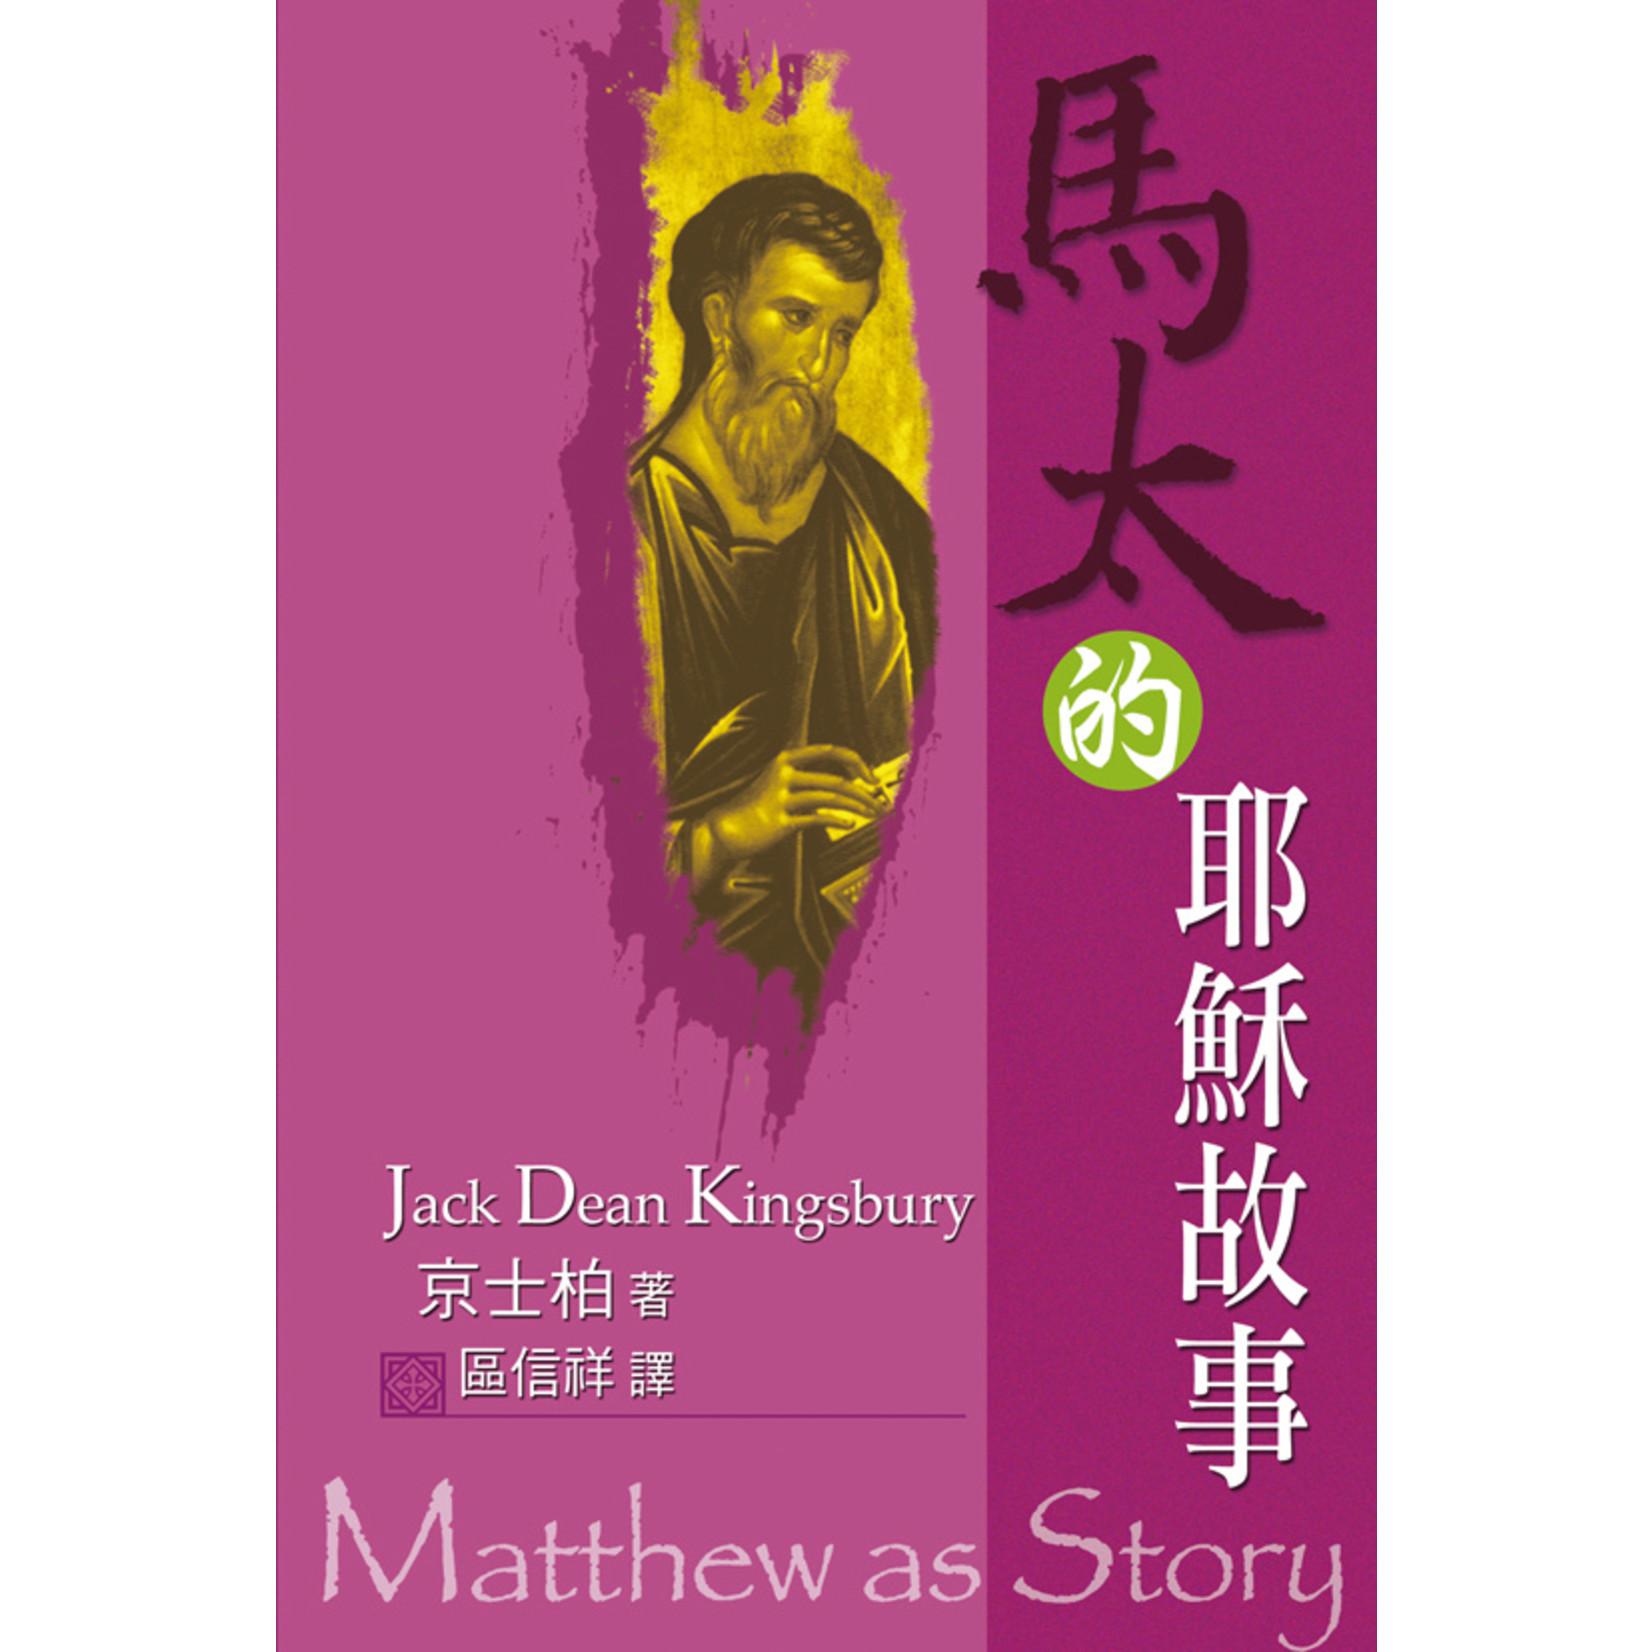 天道書樓 Tien Dao Publishing House 馬太的耶穌故事 Matthew as Story